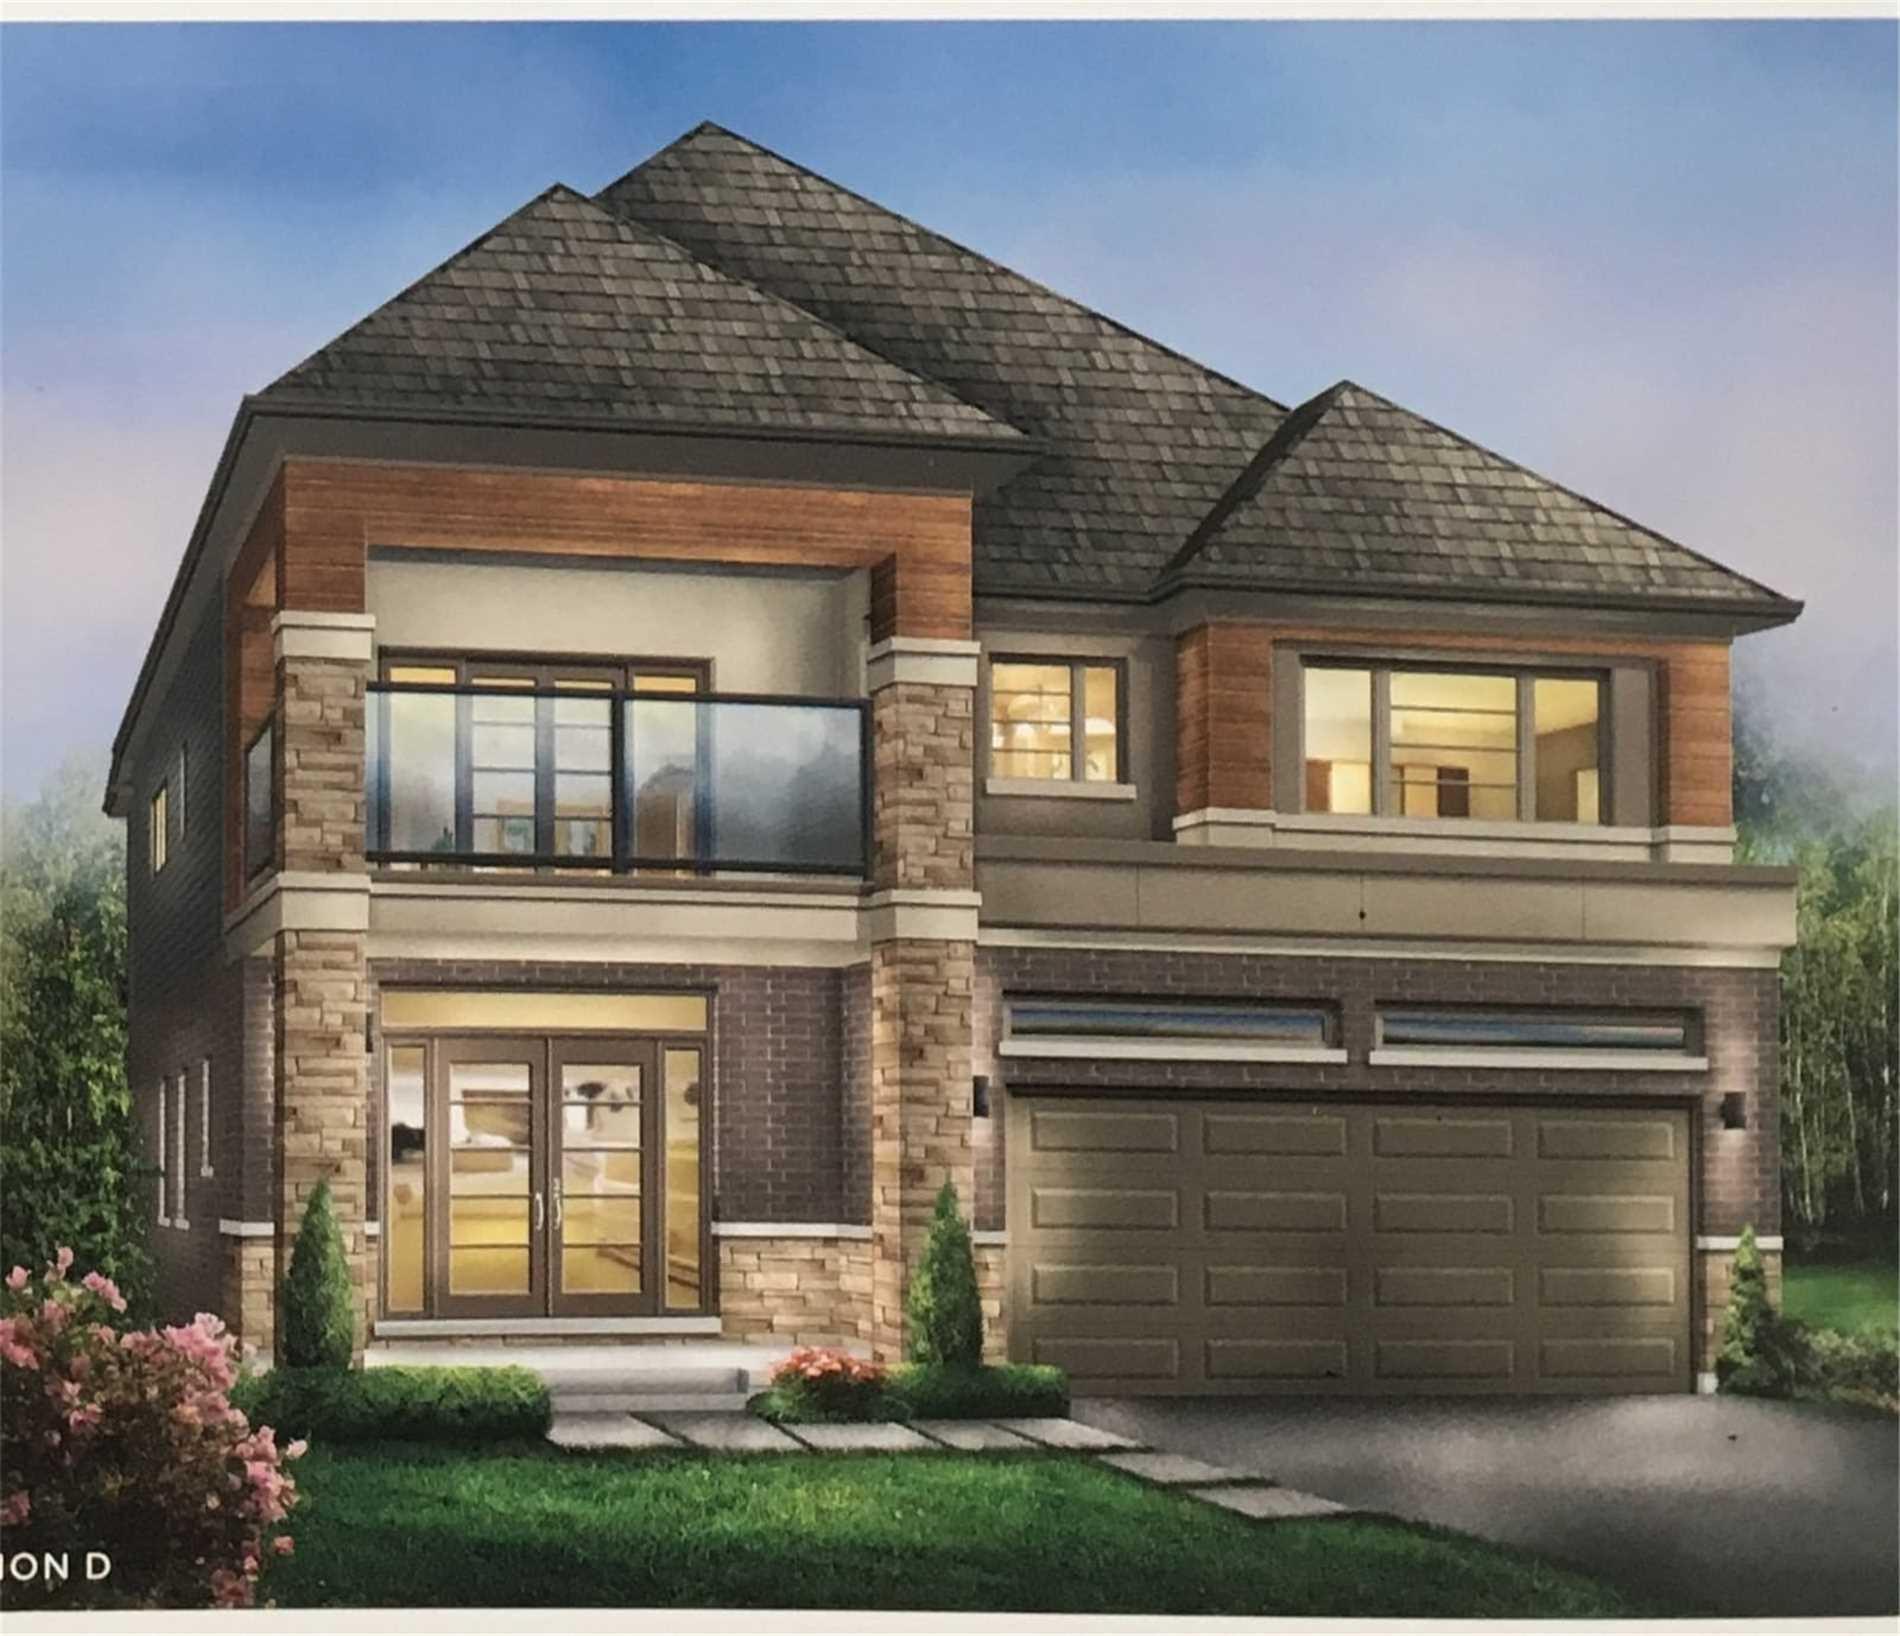 Lot 49 Scenic Ridge Gate, Brantford, Ontario 000000, 4 Bedrooms Bedrooms, 8 Rooms Rooms,4 BathroomsBathrooms,Detached,For Sale,Scenic Ridge,X5120079